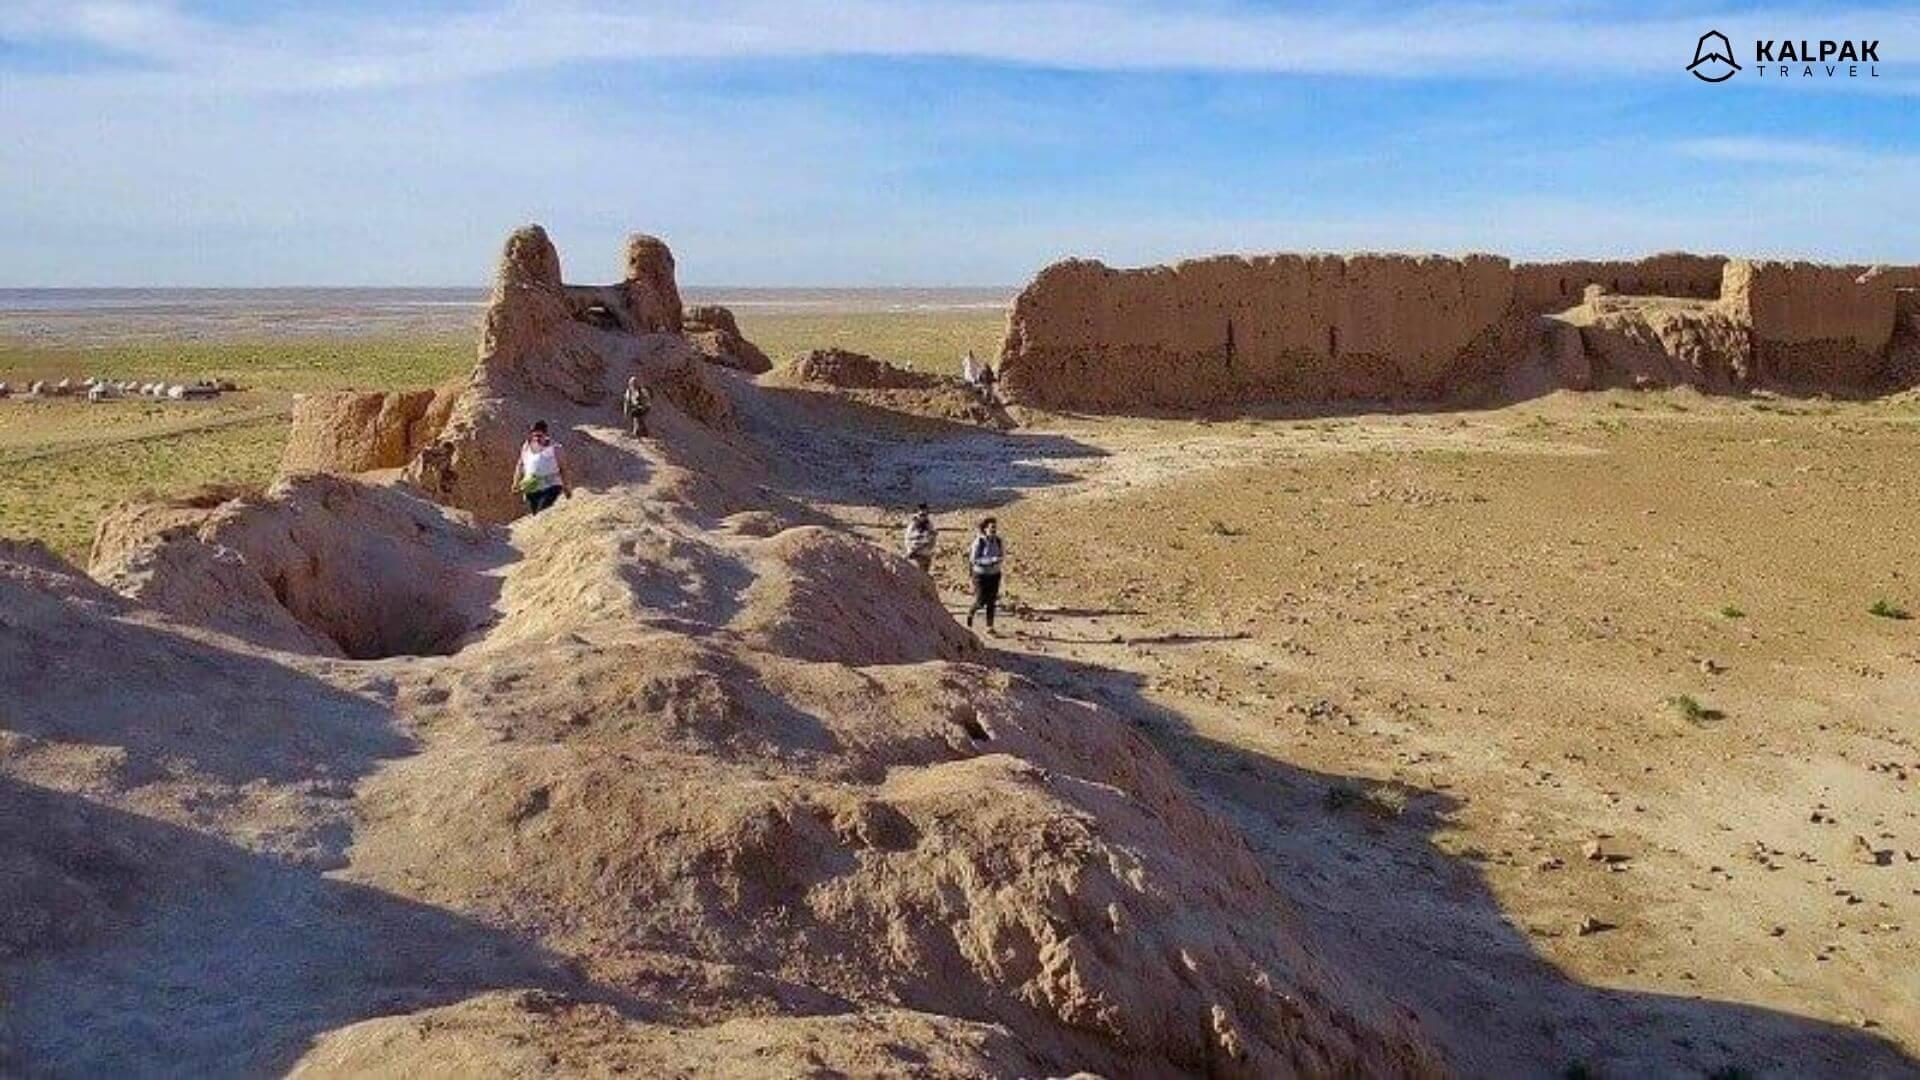 Ancient Khorezm fortresses in Uzbekistan